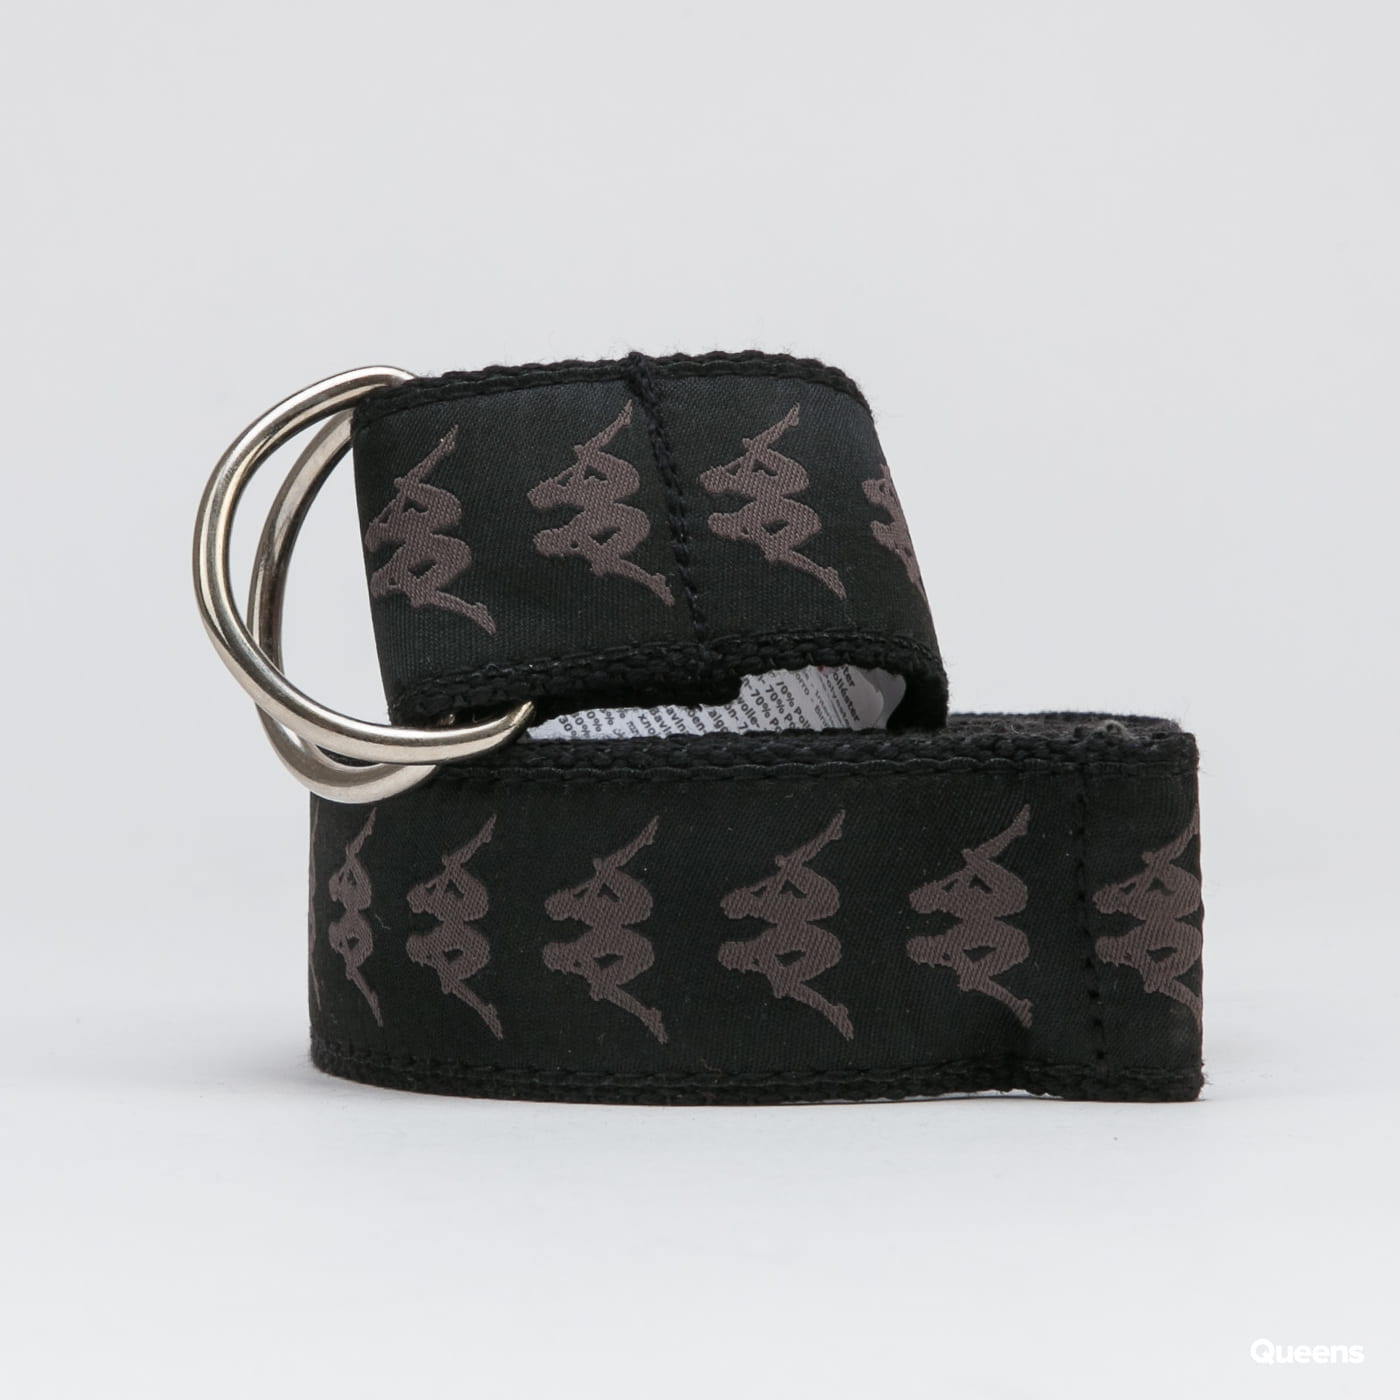 Kappa Belt 3.5 black